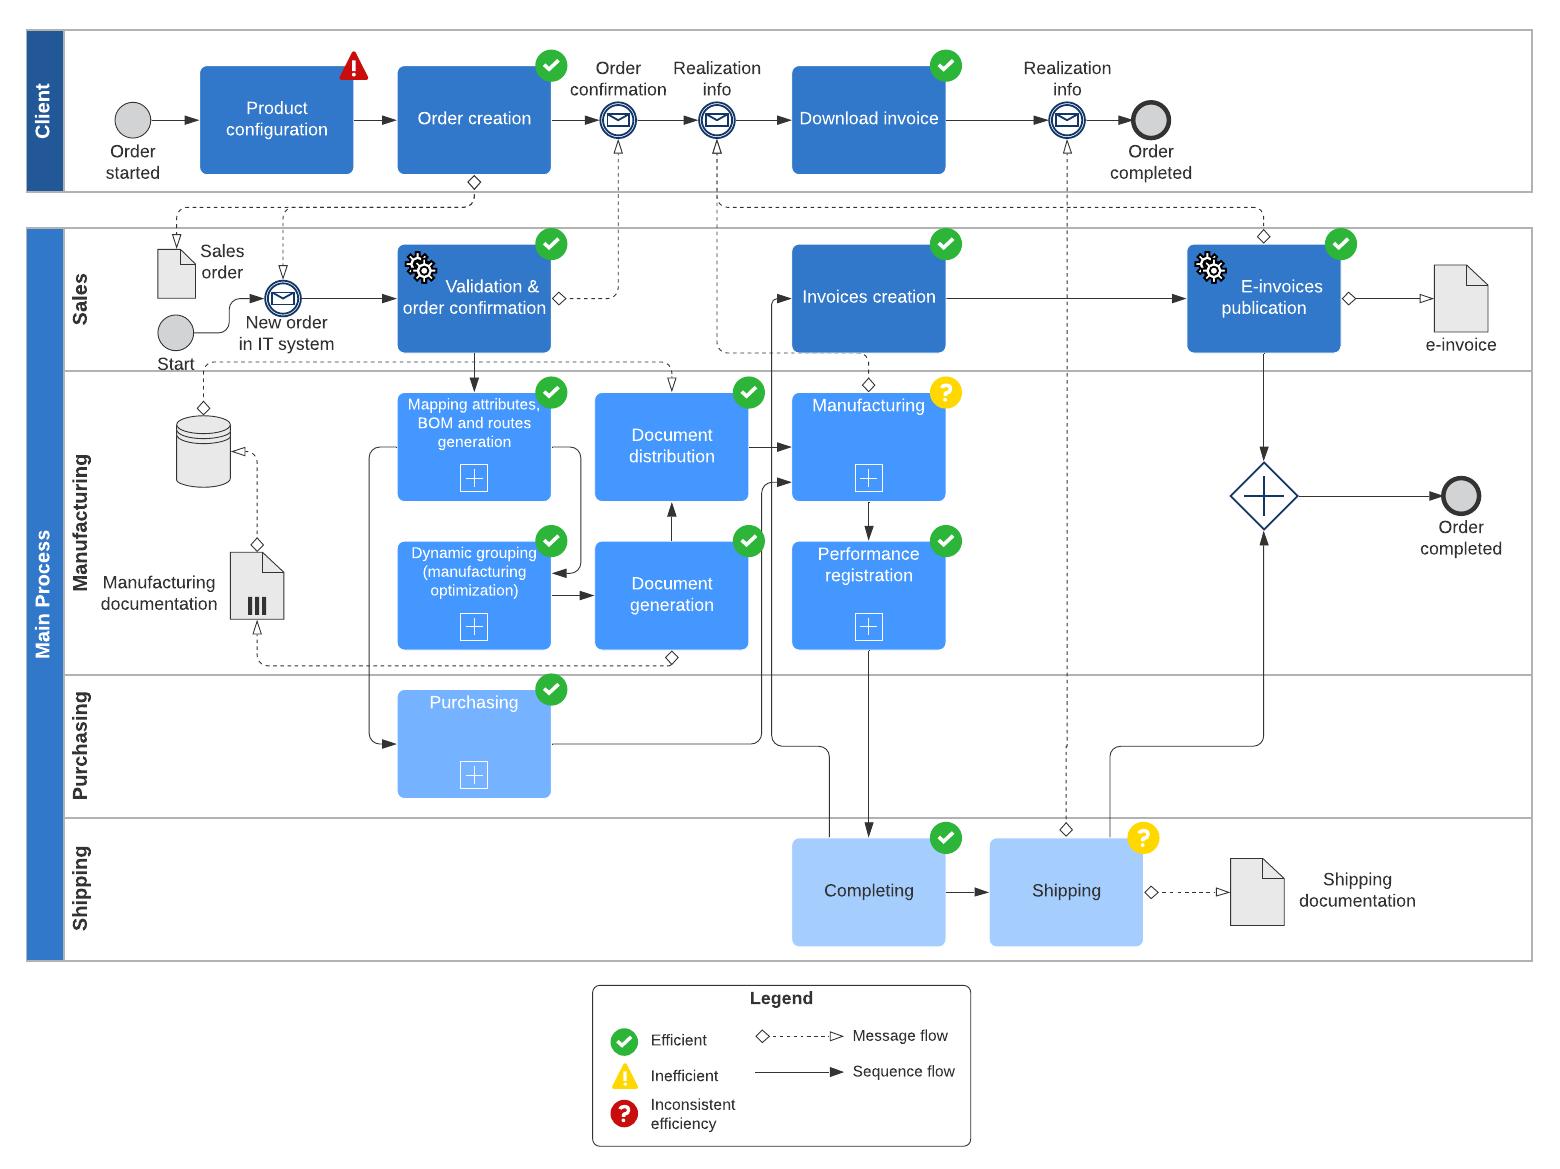 BPMN process example